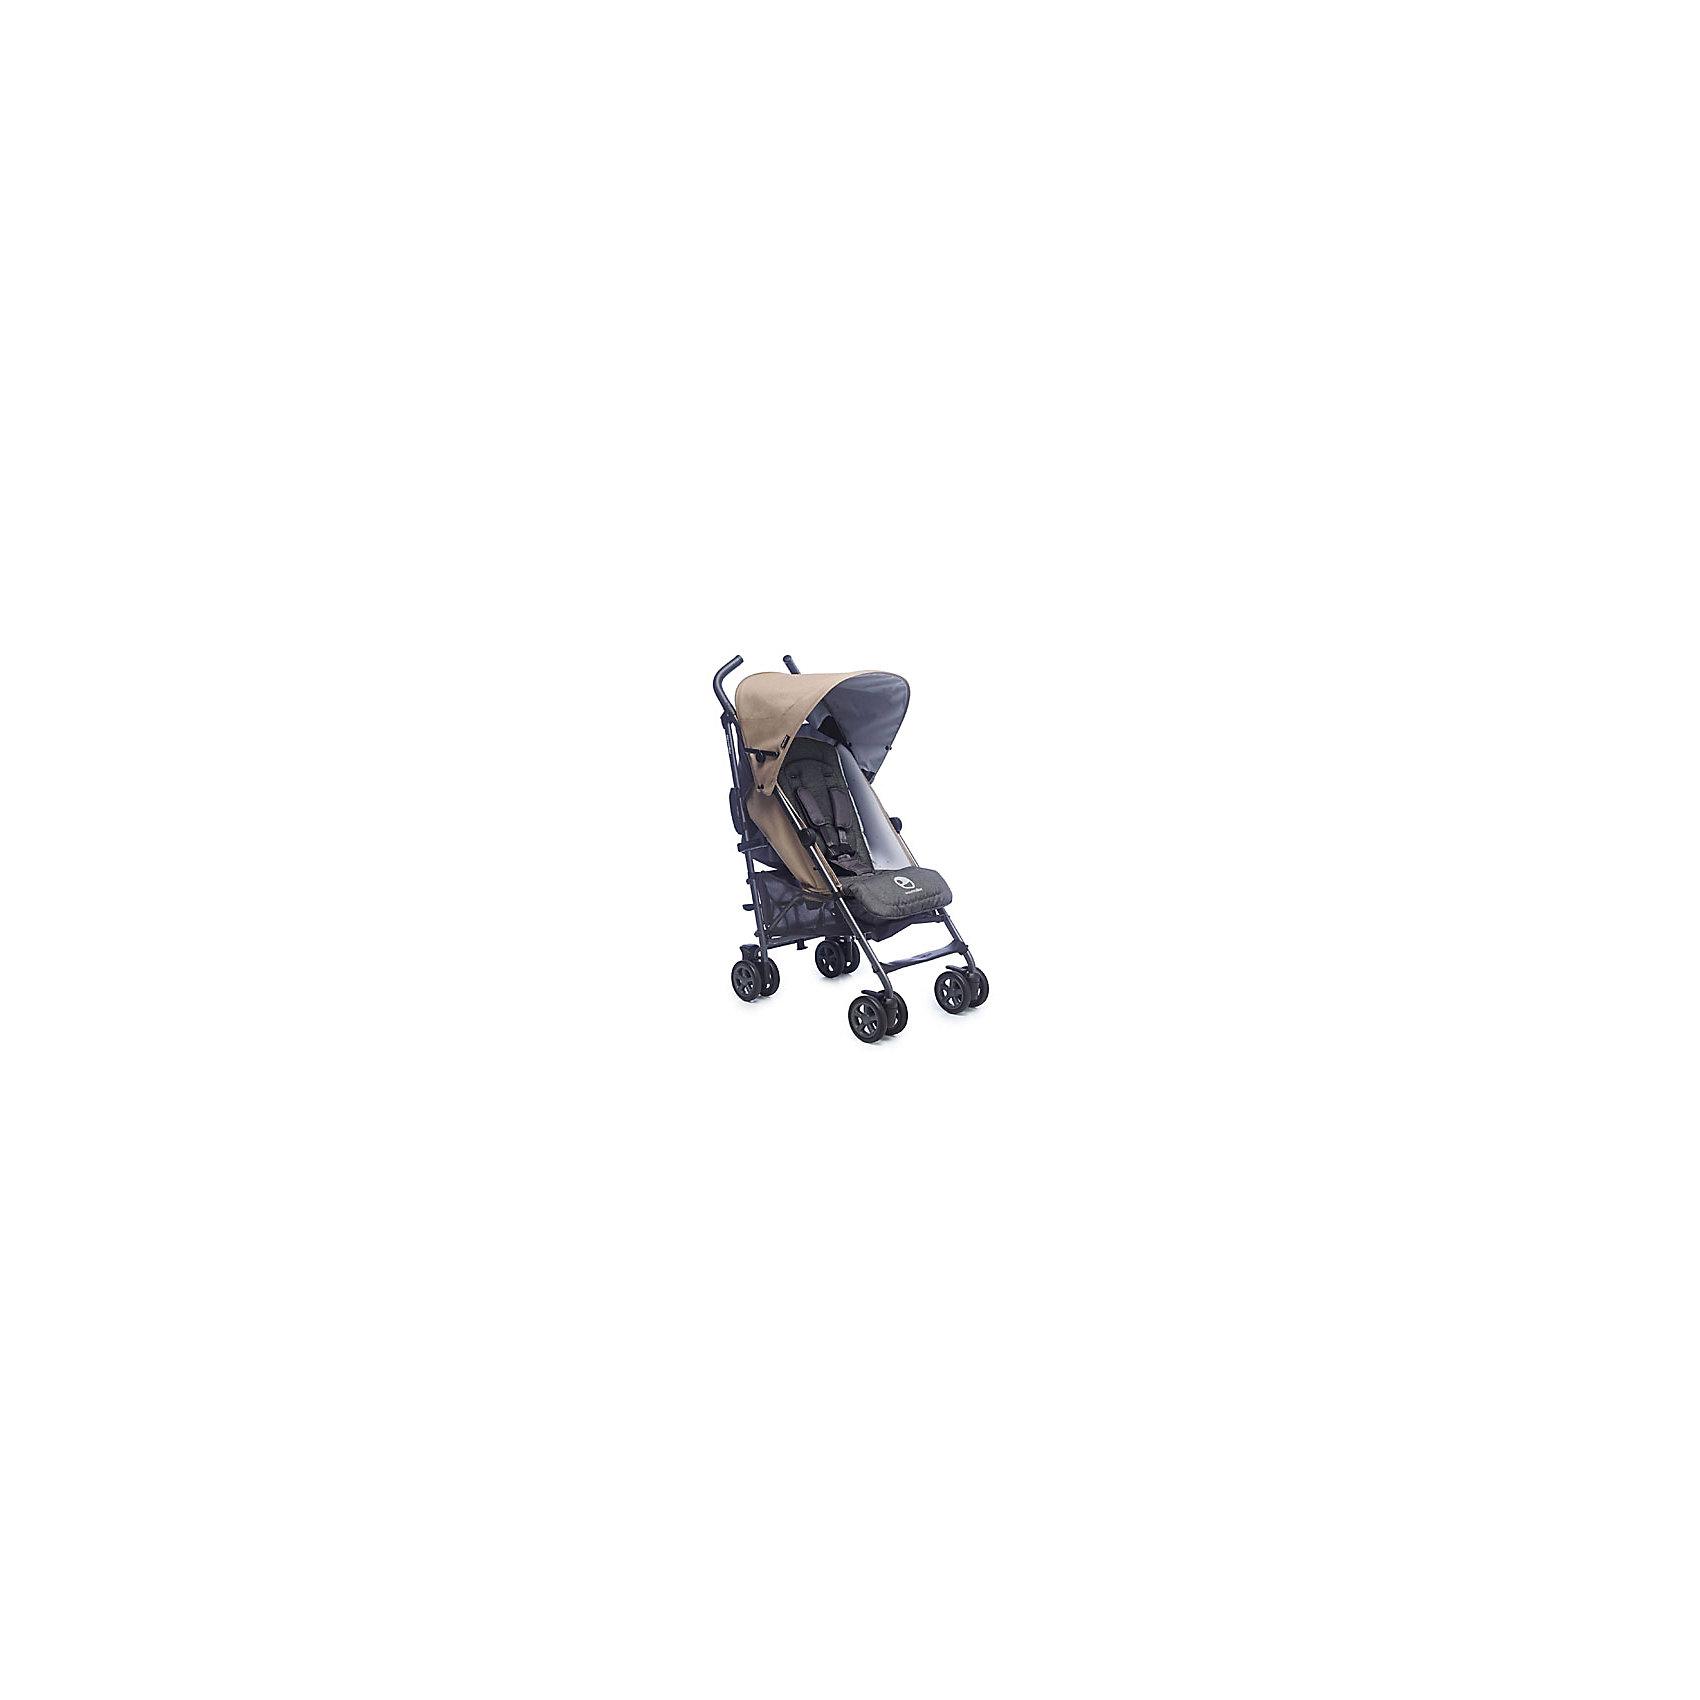 Коляска-трость Easywalker Buggy Ibiza Brunch,Коляски-трости<br>EB10006 Коляска Easywalker buggy Ibiza Brunch + EB10102 Бампер Easywalker buggy bumper bar Peat<br><br>Ширина мм: 1100<br>Глубина мм: 230<br>Высота мм: 300<br>Вес г: 9540<br>Возраст от месяцев: 0<br>Возраст до месяцев: 48<br>Пол: Унисекс<br>Возраст: Детский<br>SKU: 5613112